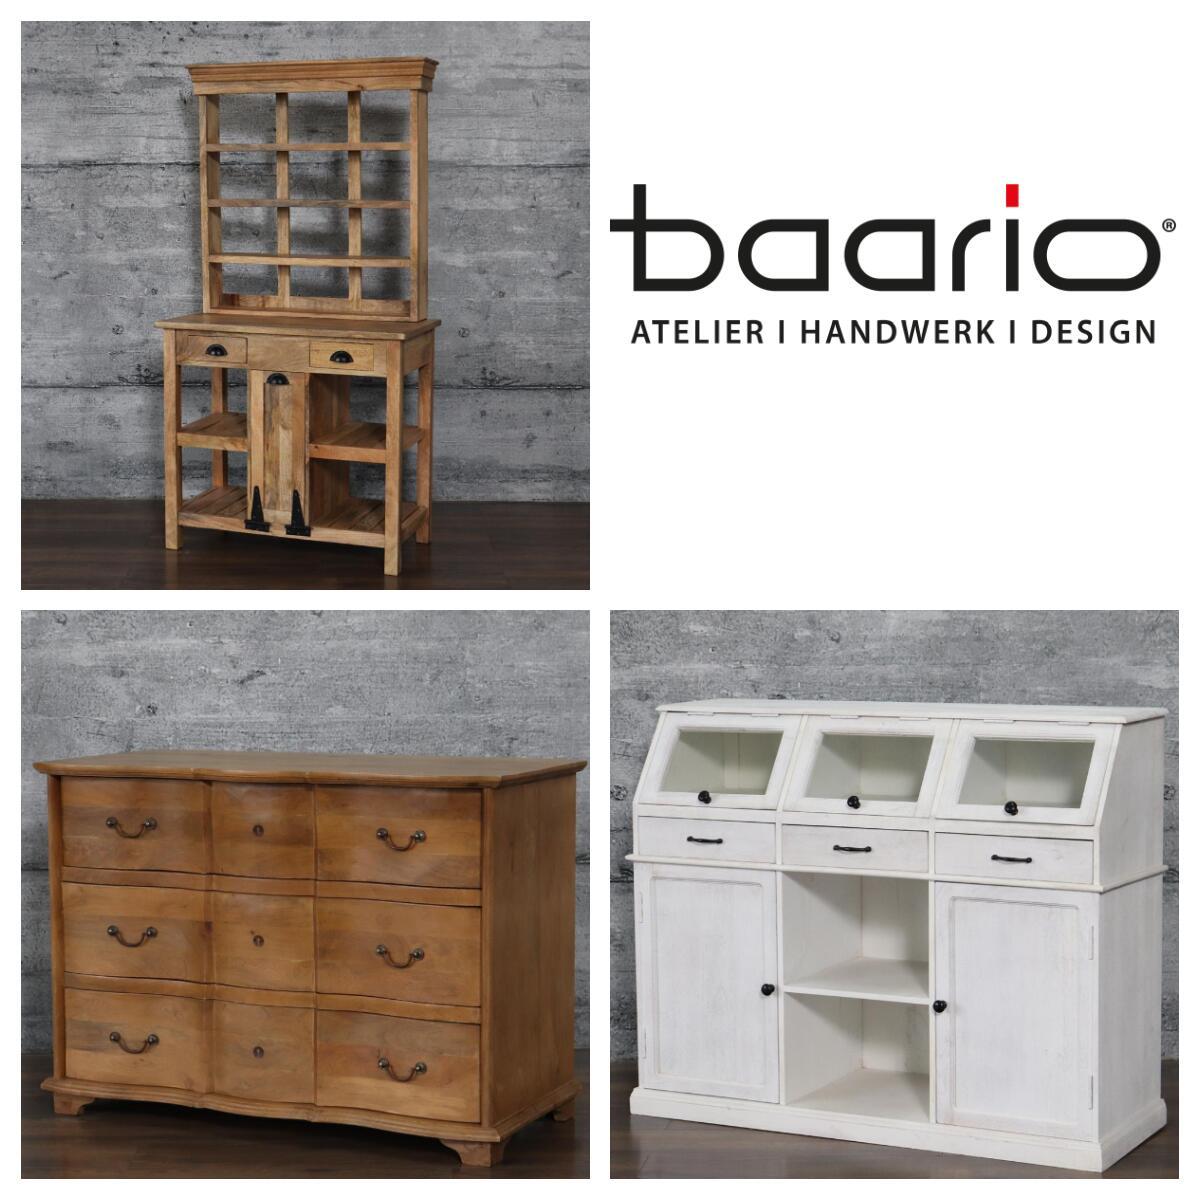 richmond-interior-moebel-design-atelier-baario